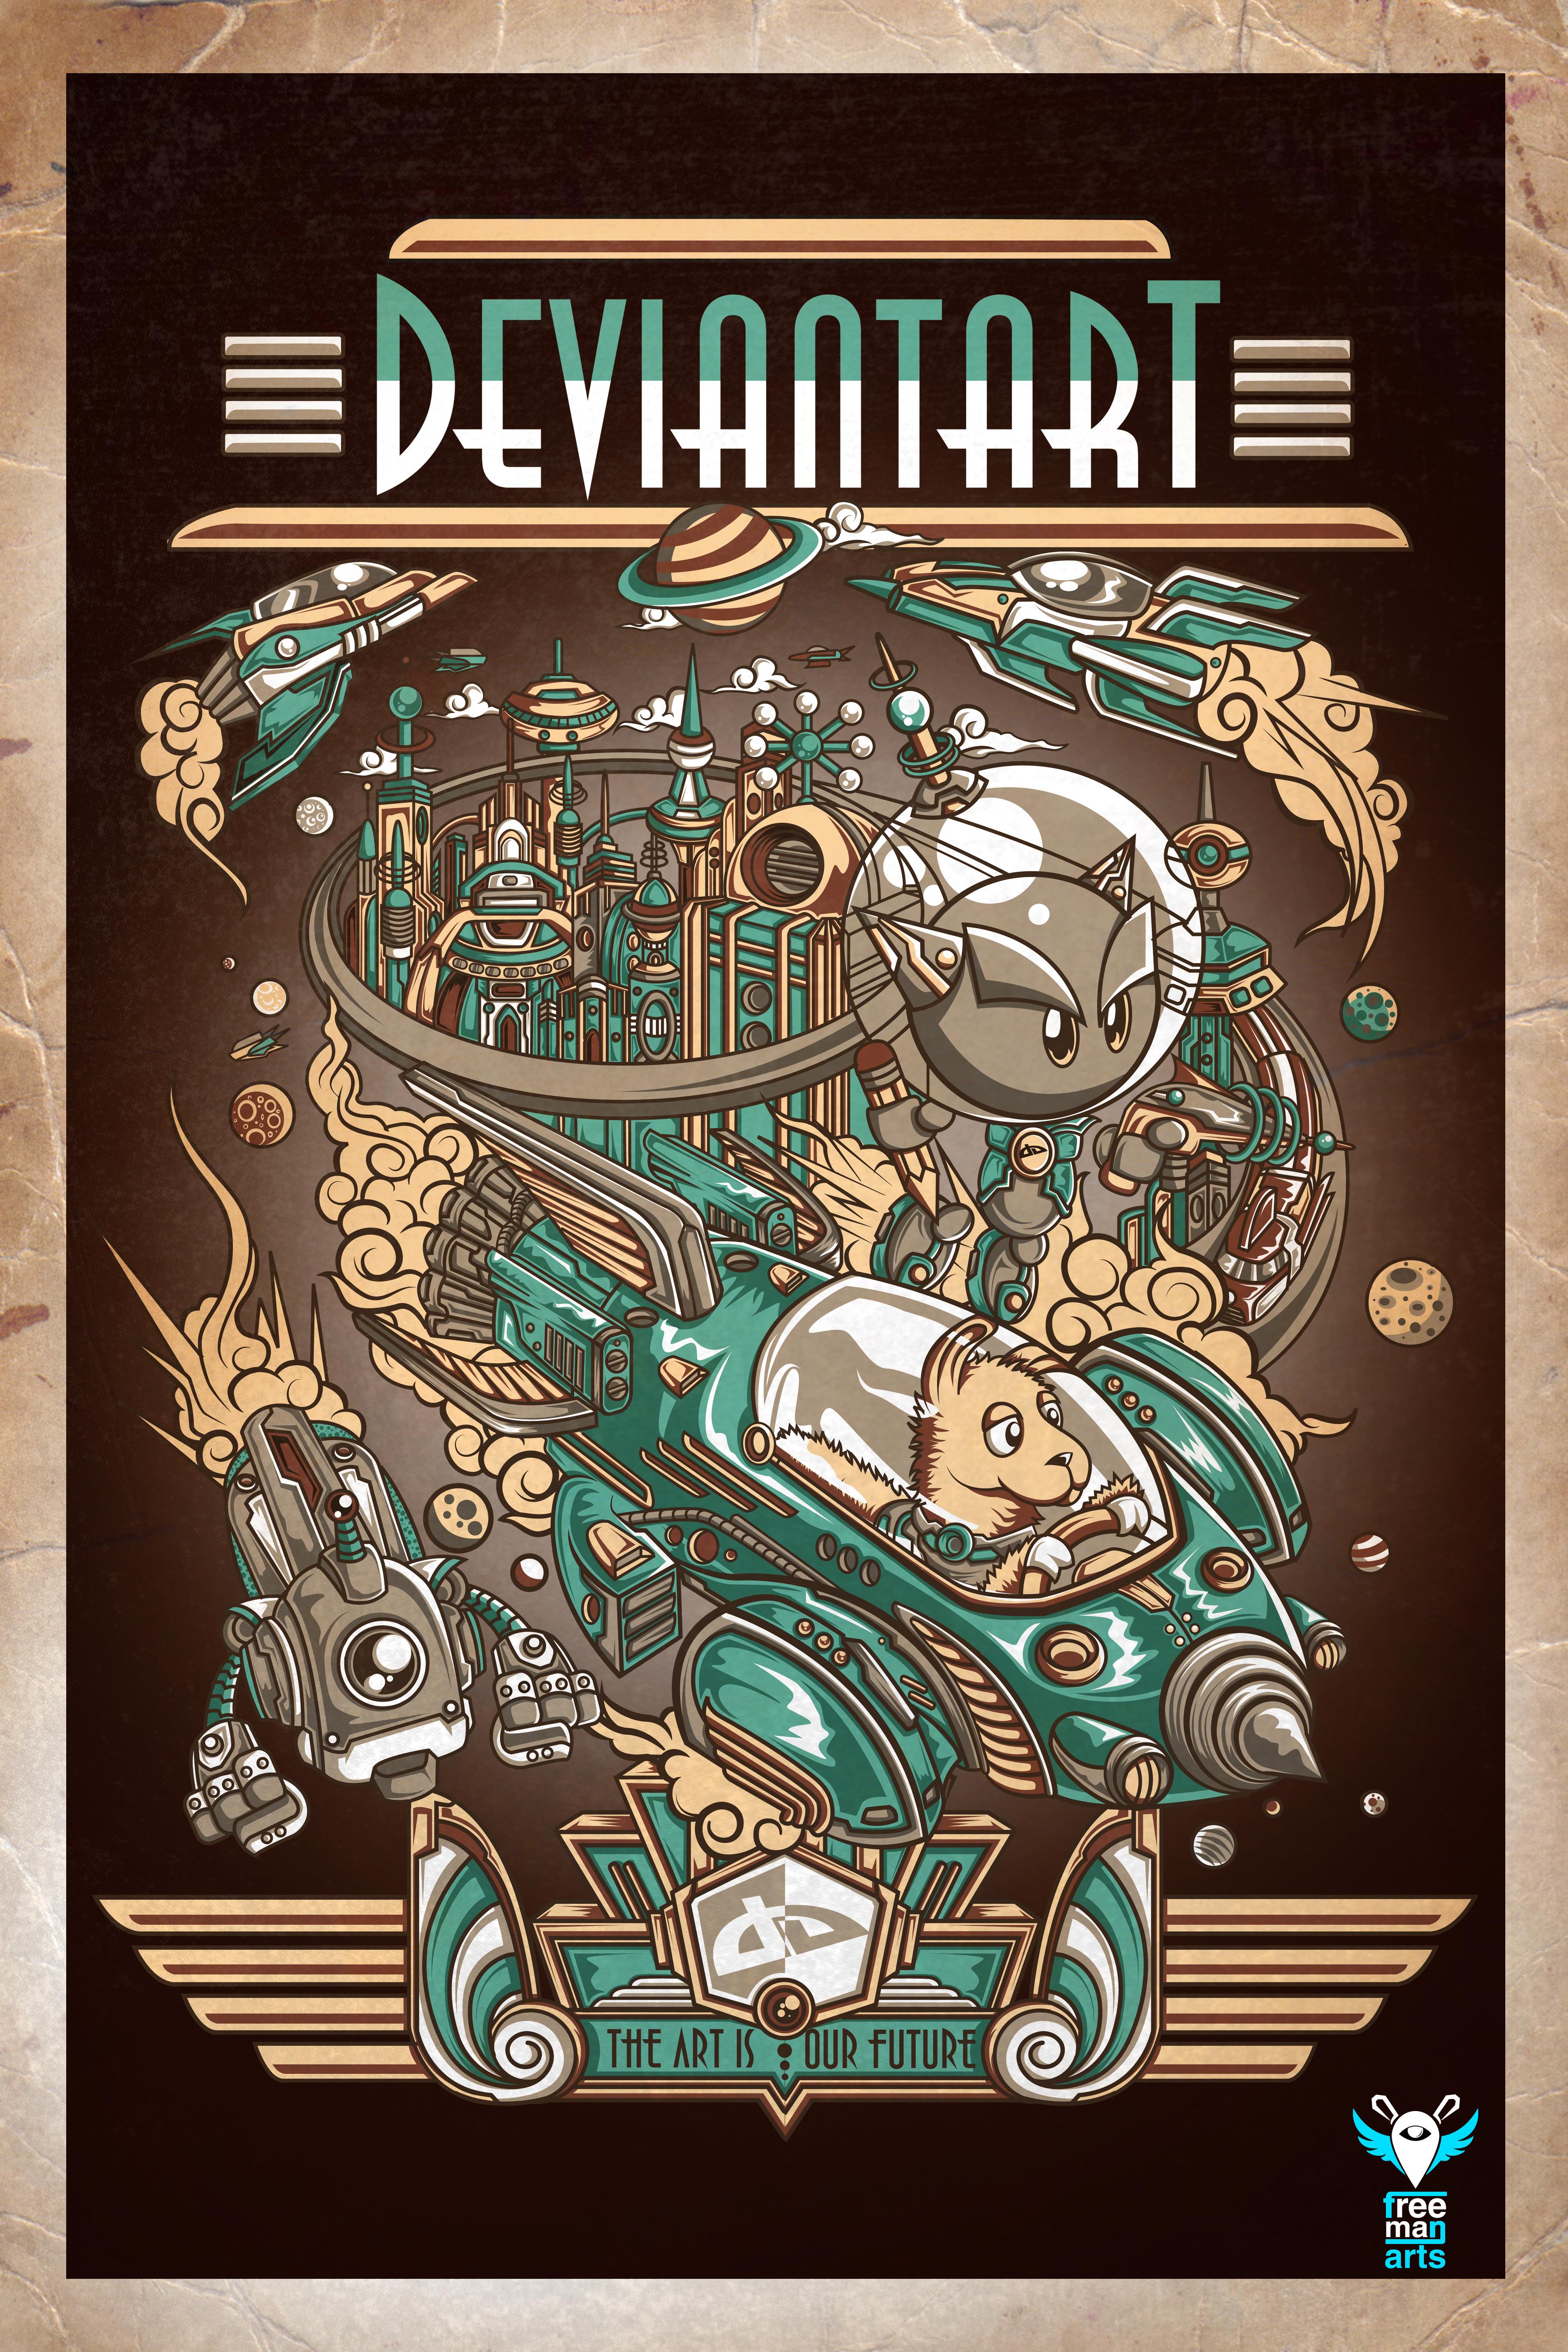 Retro Poster by jml2art